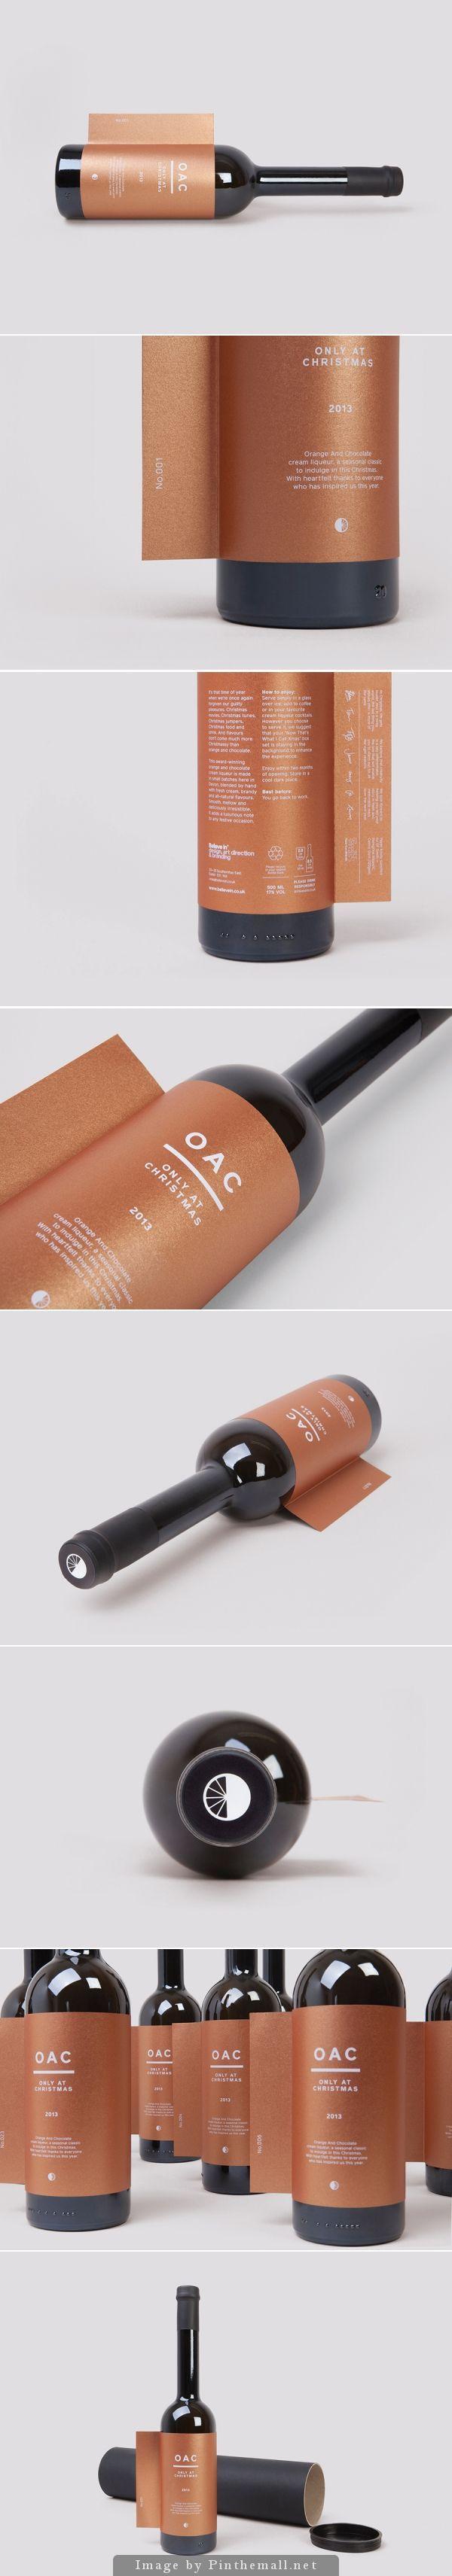 #branding #packaging #design